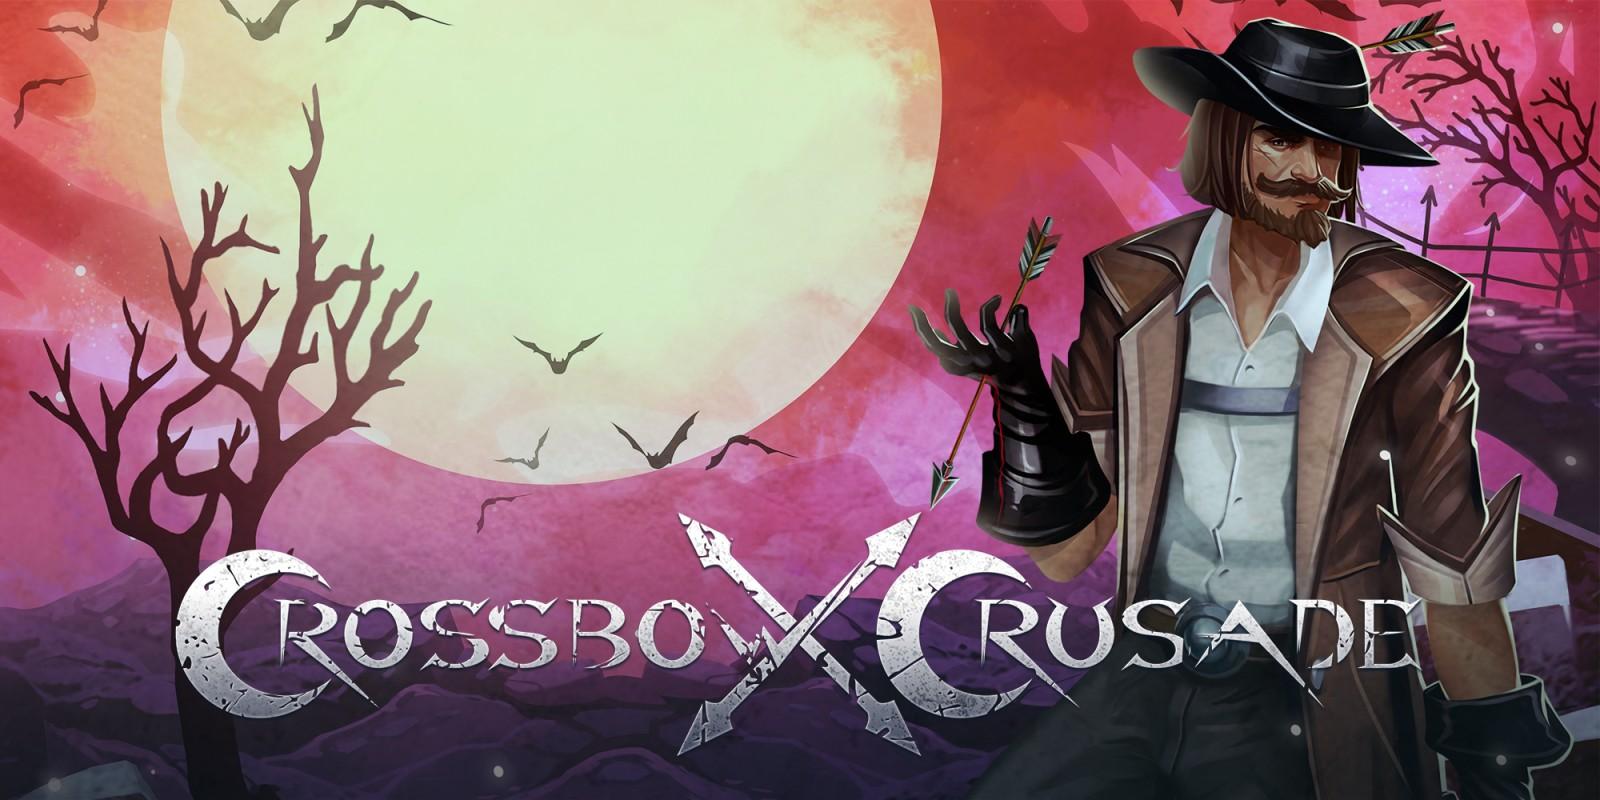 Crossbow Crusade